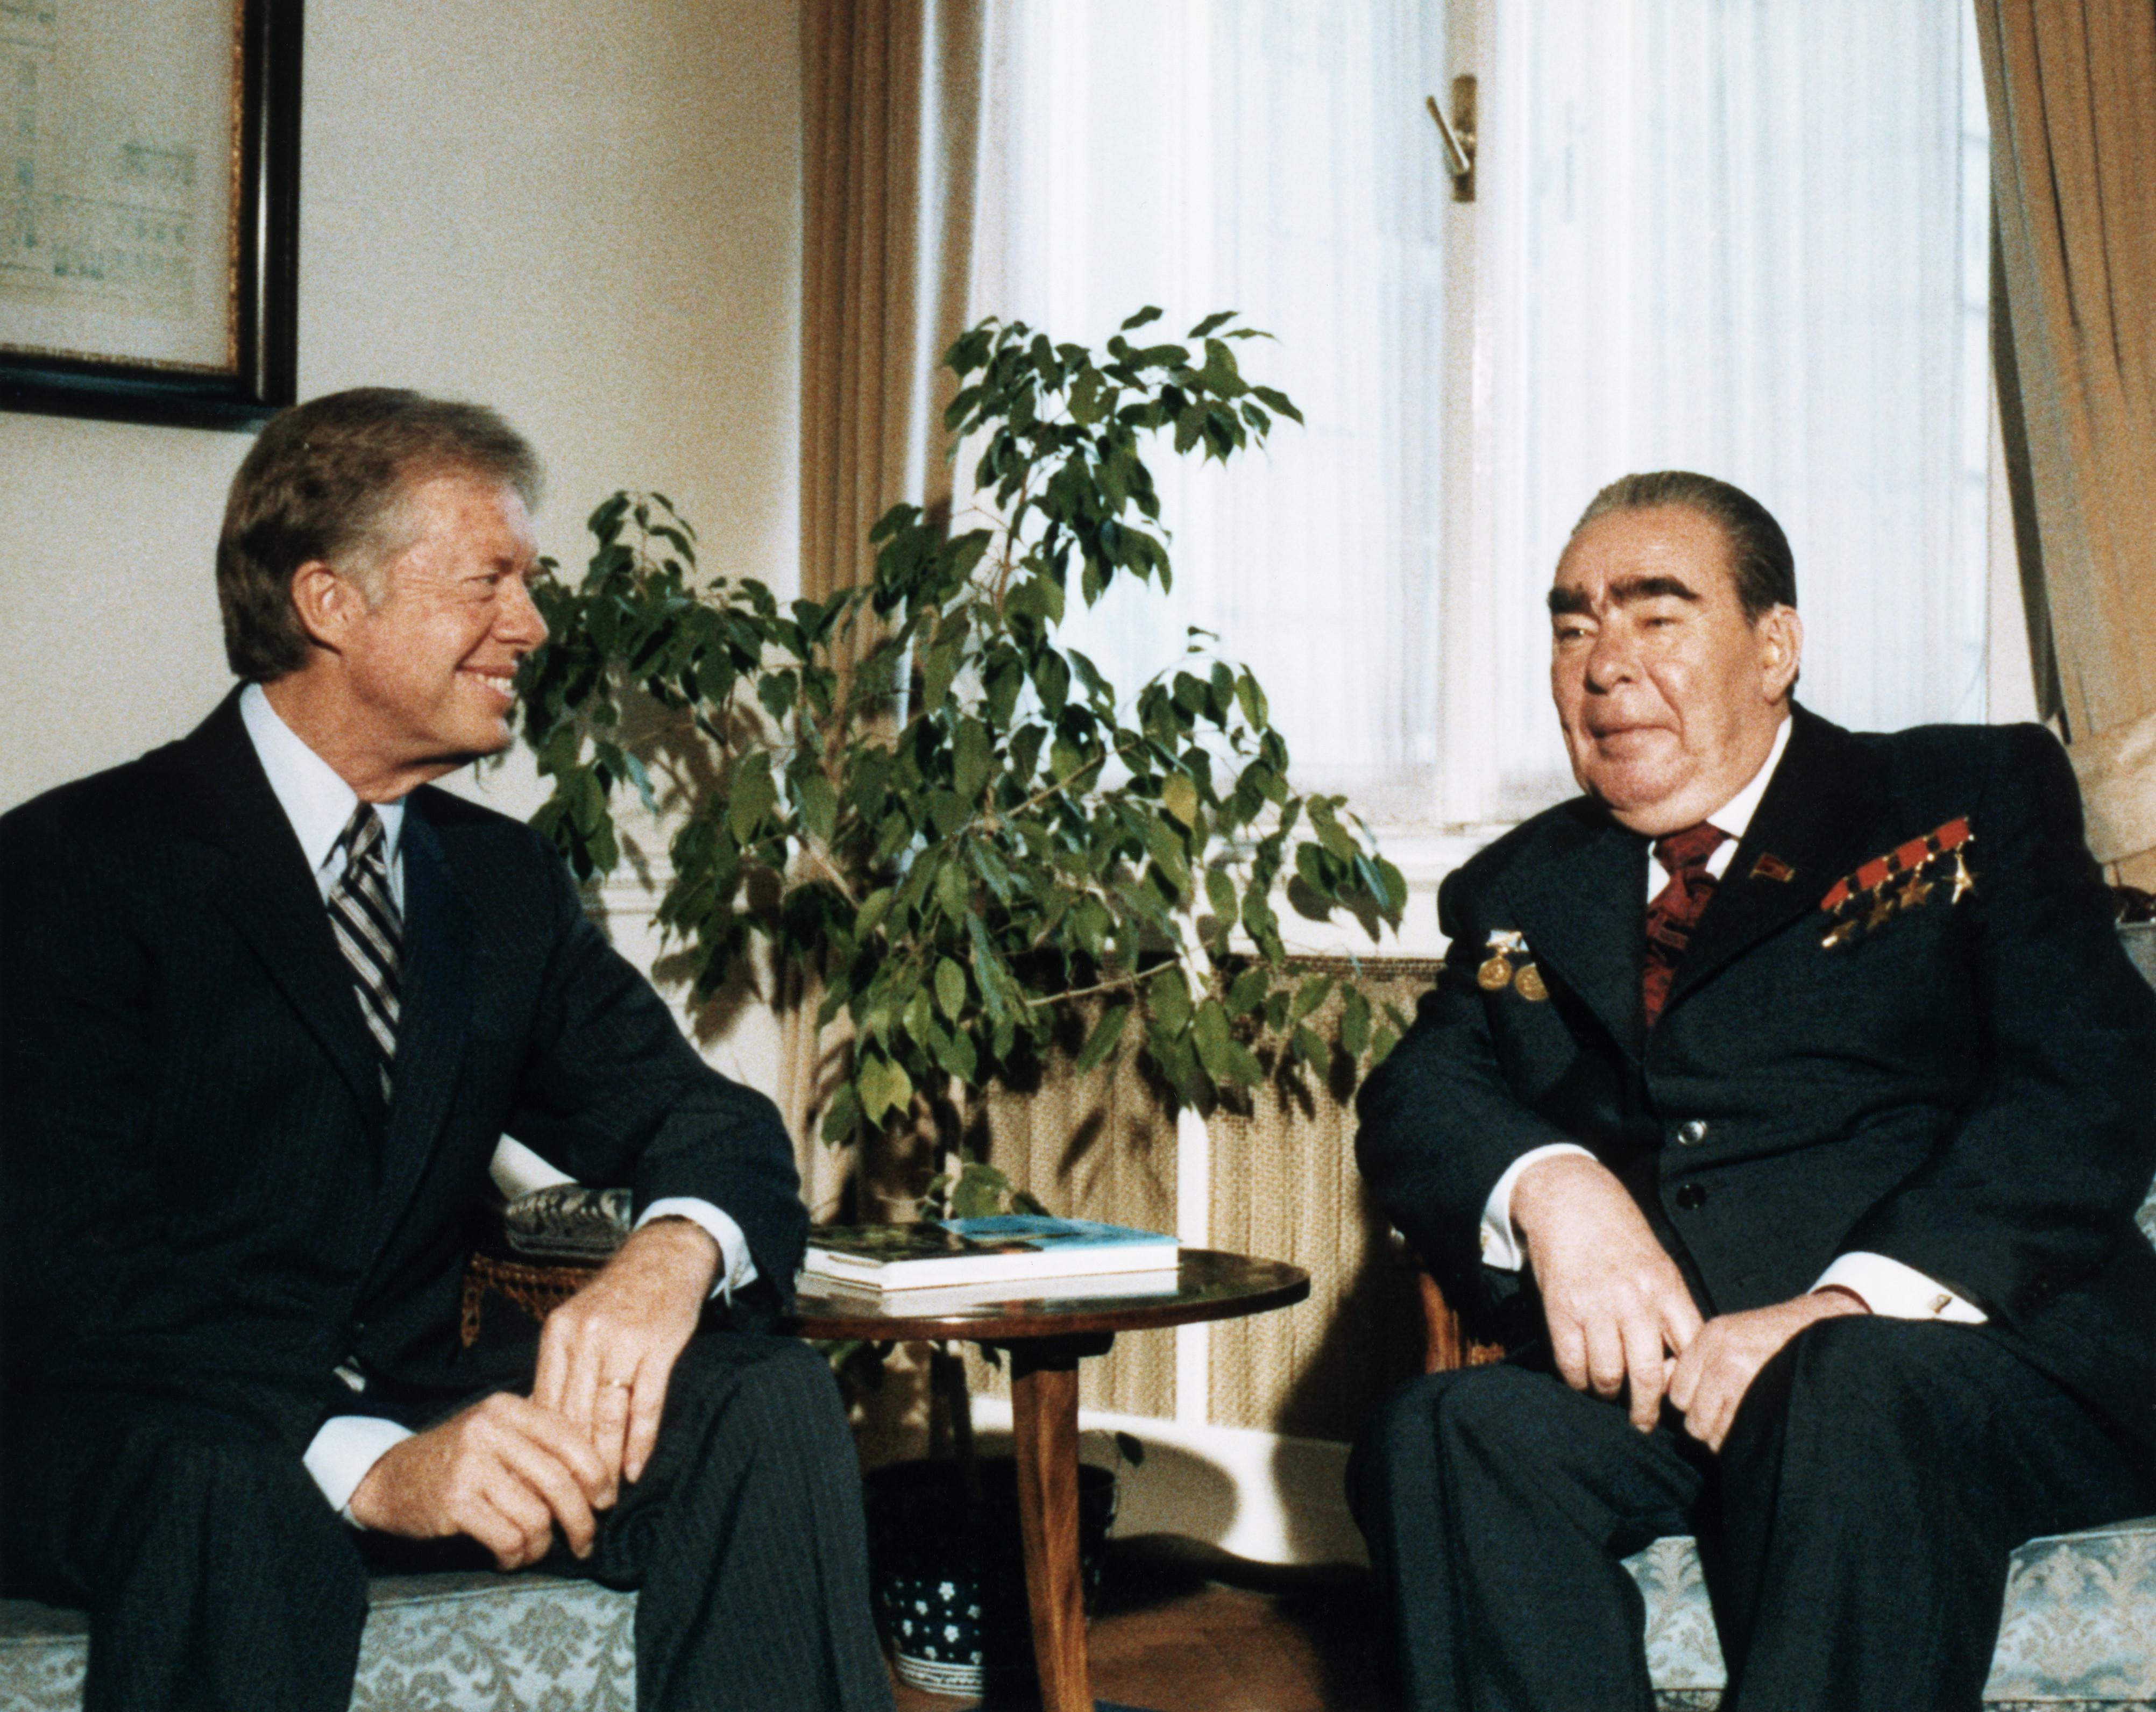 Brezhnev-and-carter-at-salt-talks